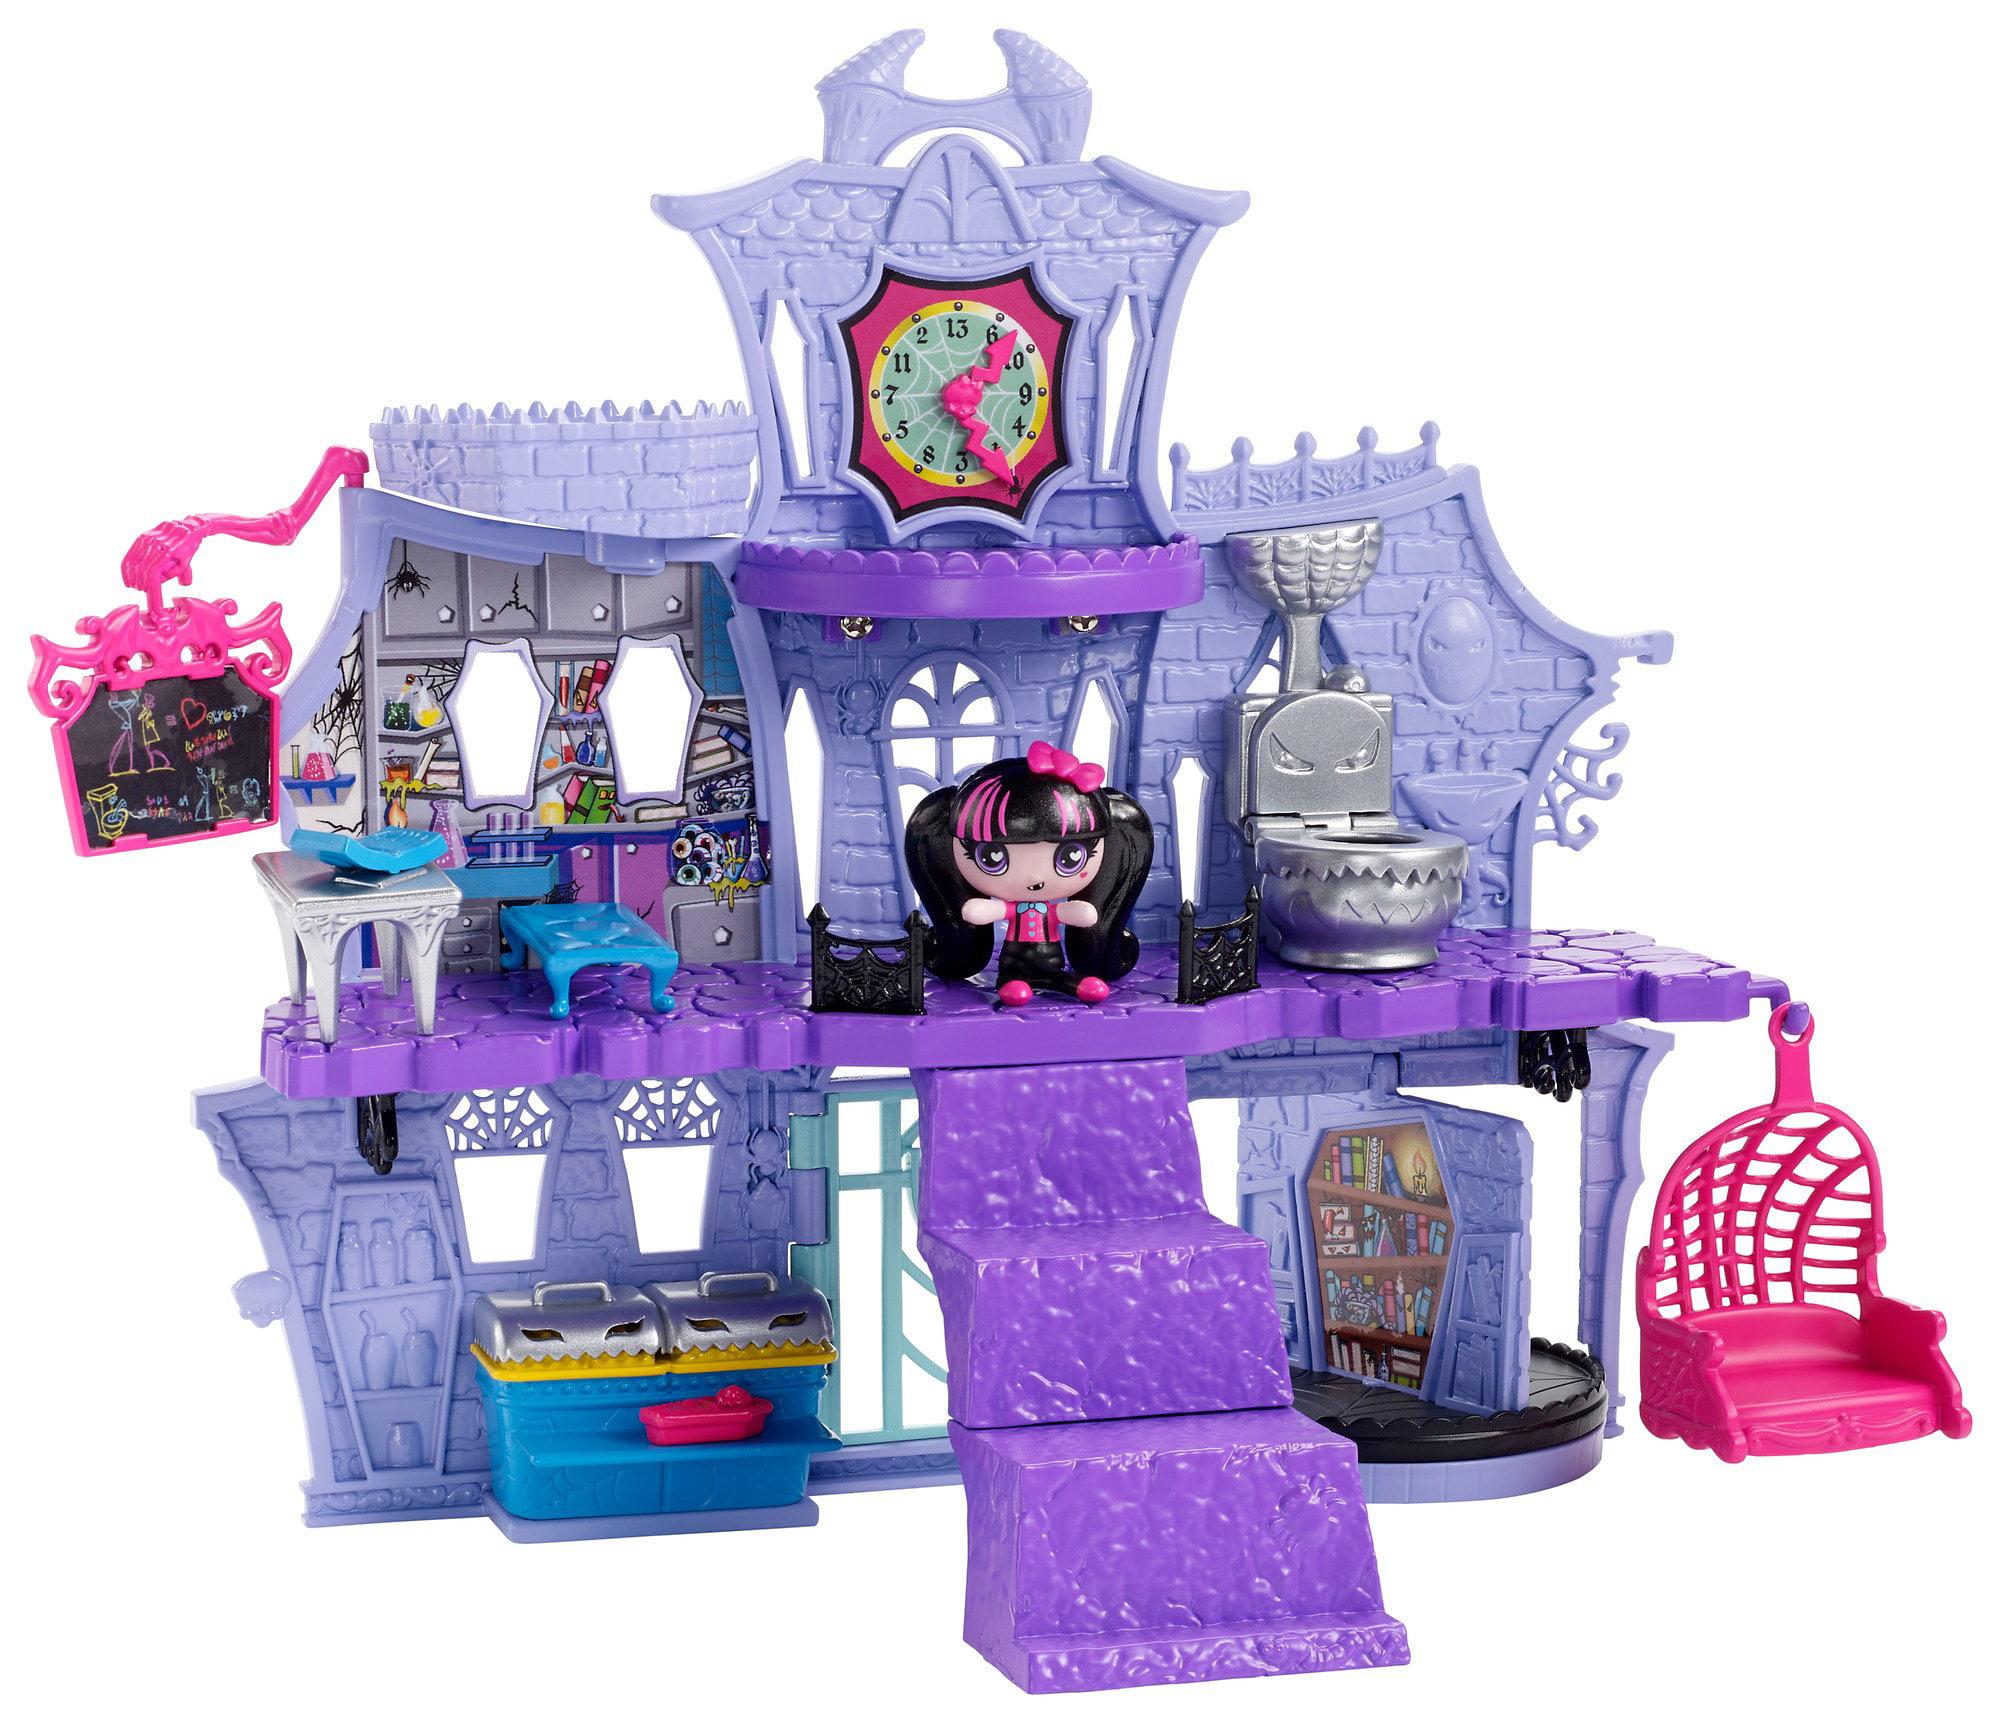 Monster High Minis Playset by Mattel